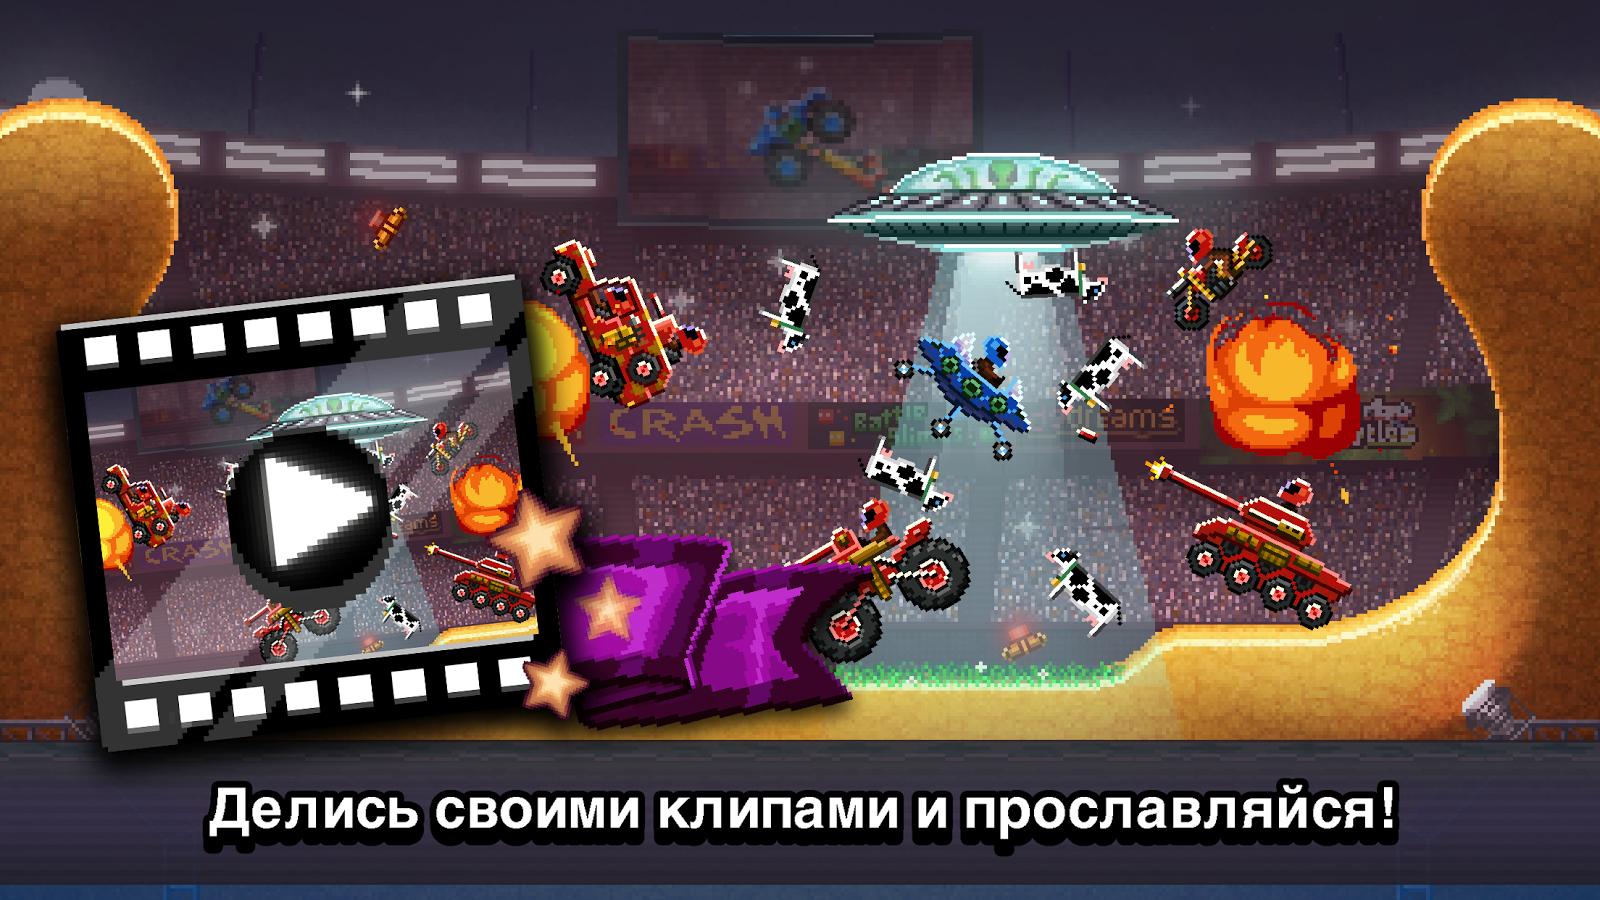 Скачать drive ahead! Sports (мод: много денег) на андроид. Взлом.